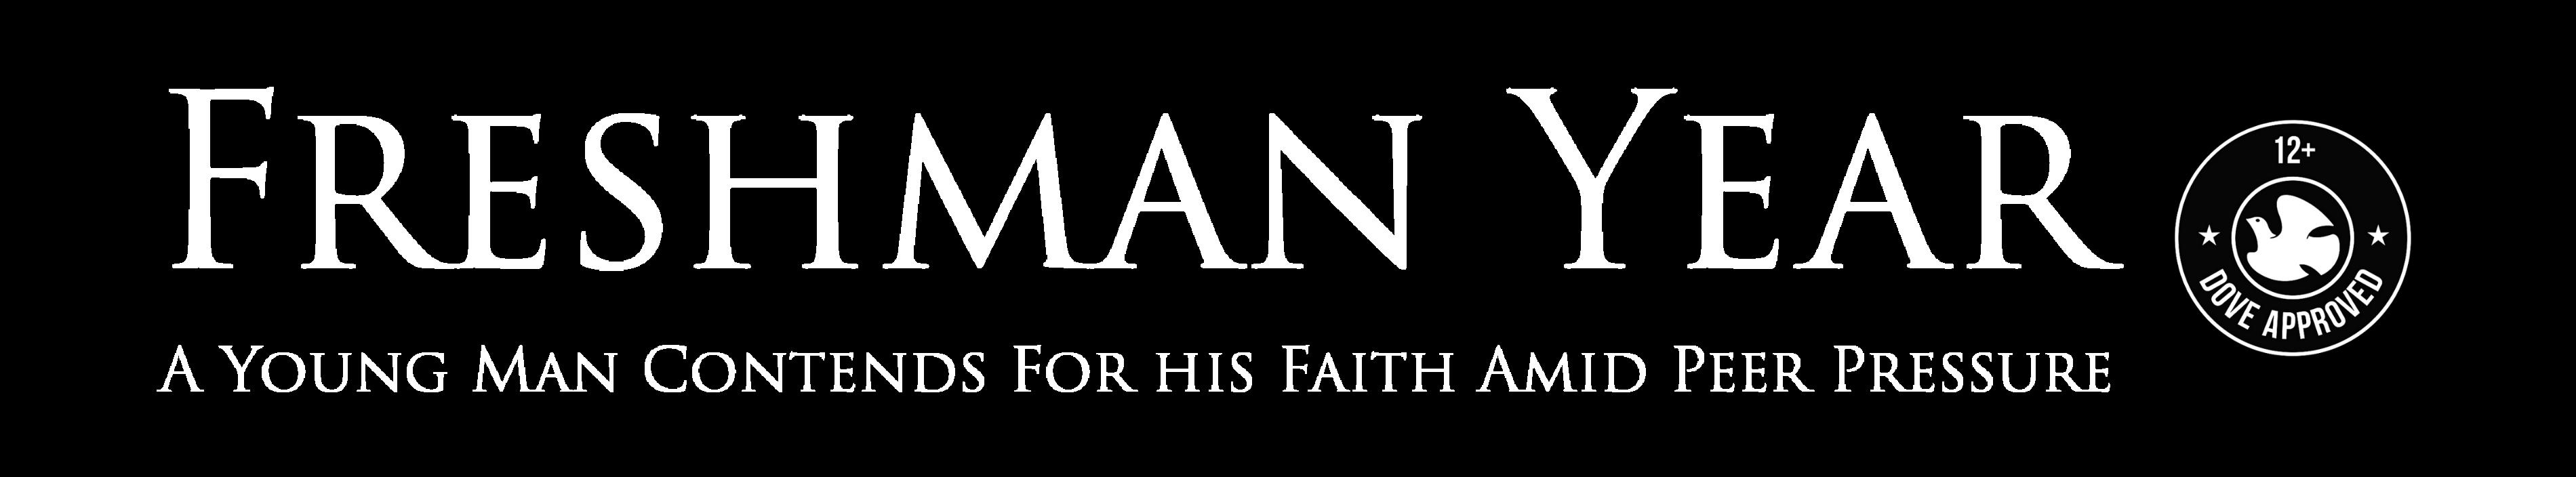 Freshman Year Anchor Media Studios Faith Based Films Dublin California